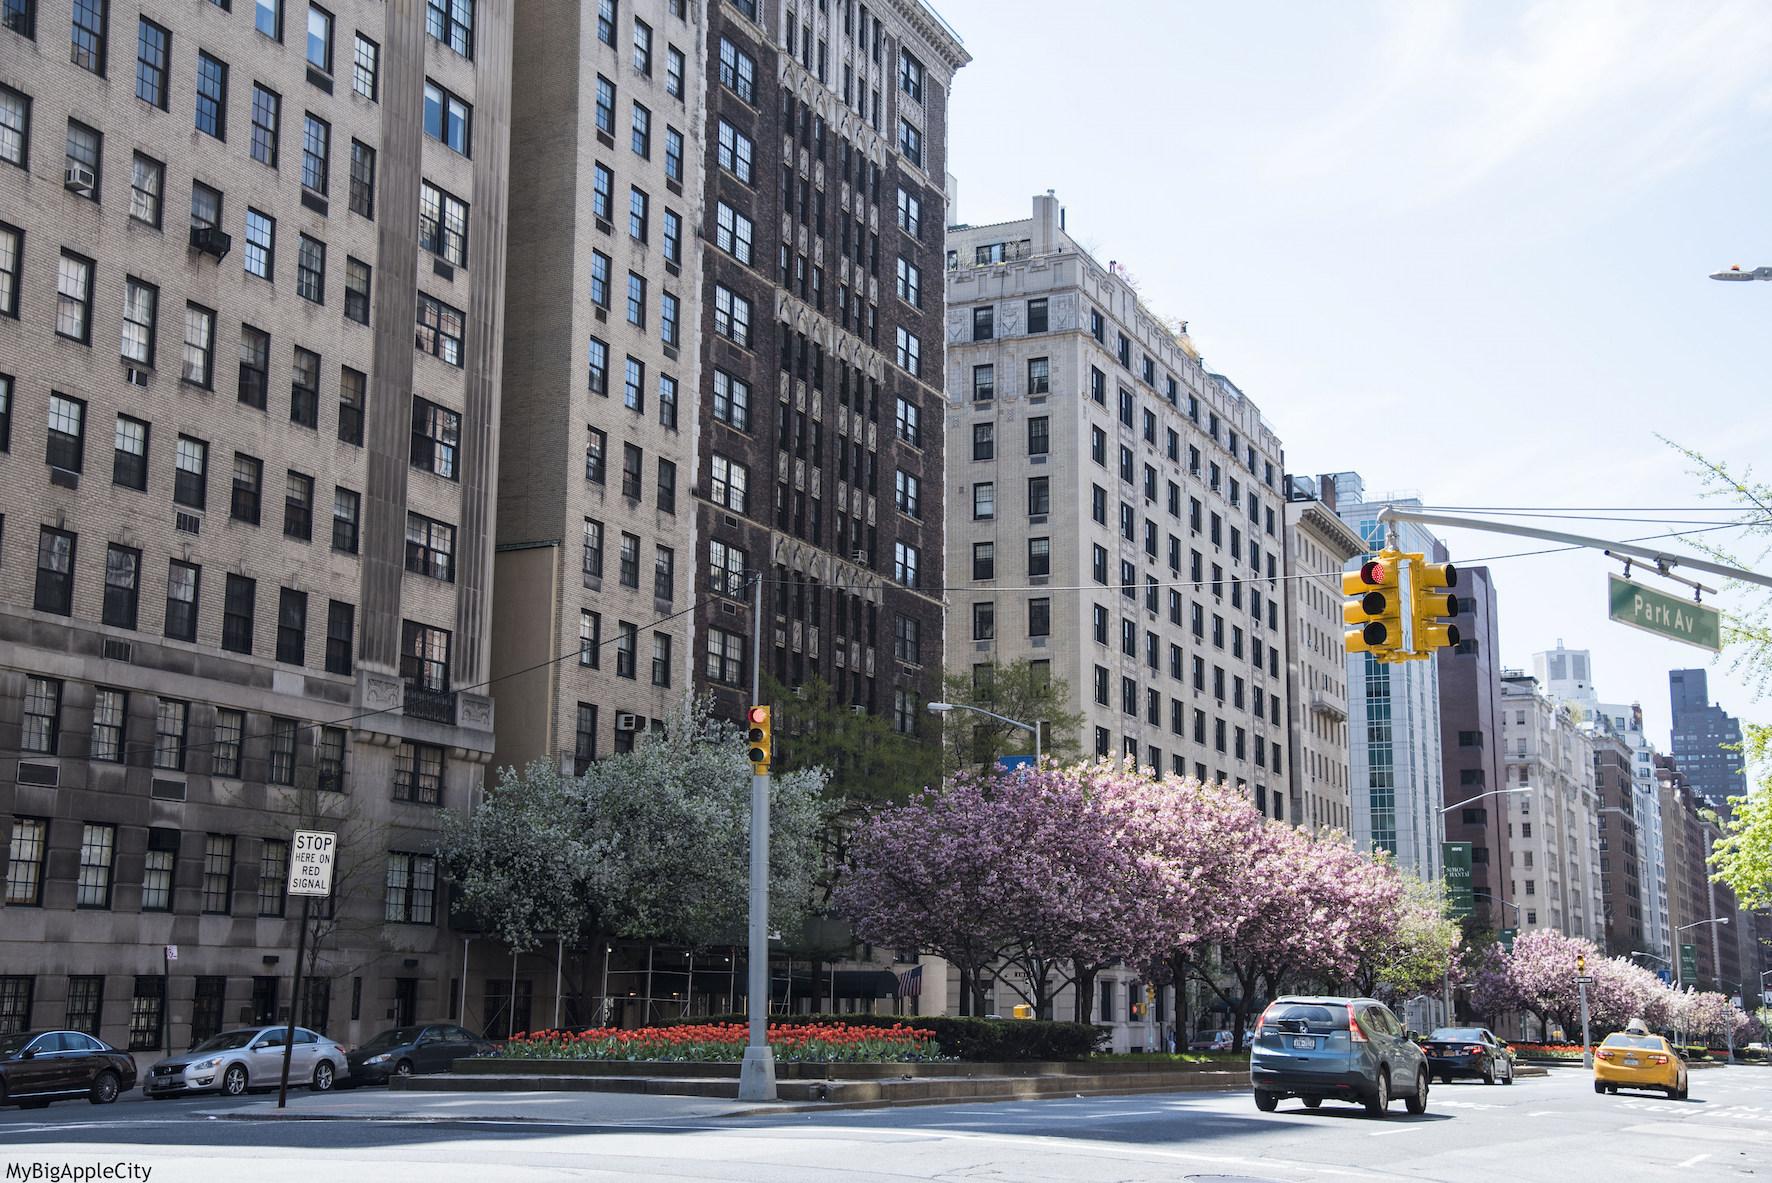 Park-avenue-NYC-travel-blogger-photography